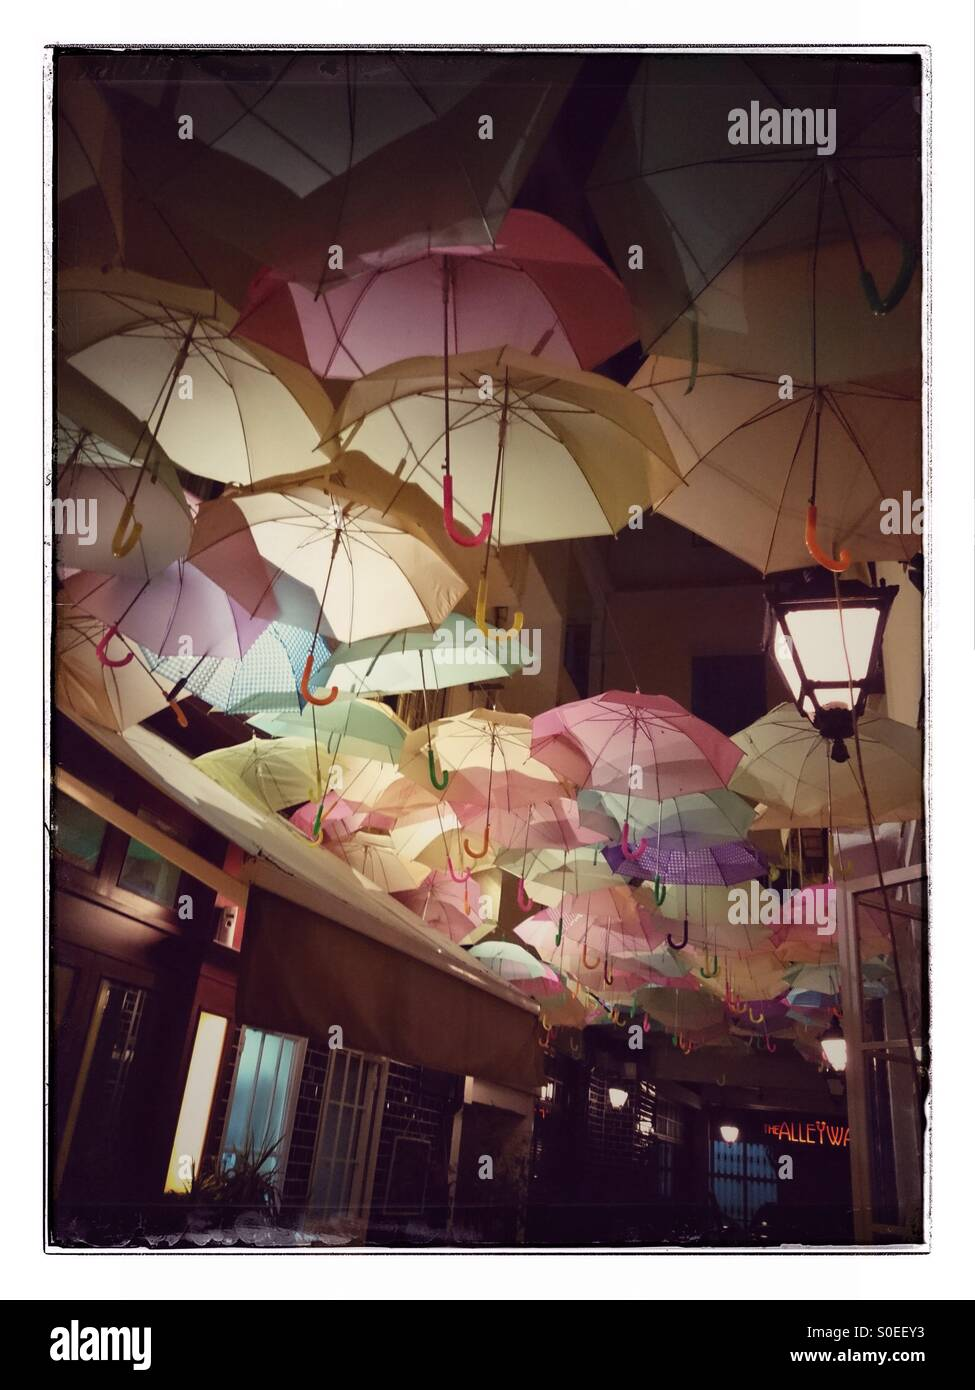 Paraguas Beirut Imagen De Stock